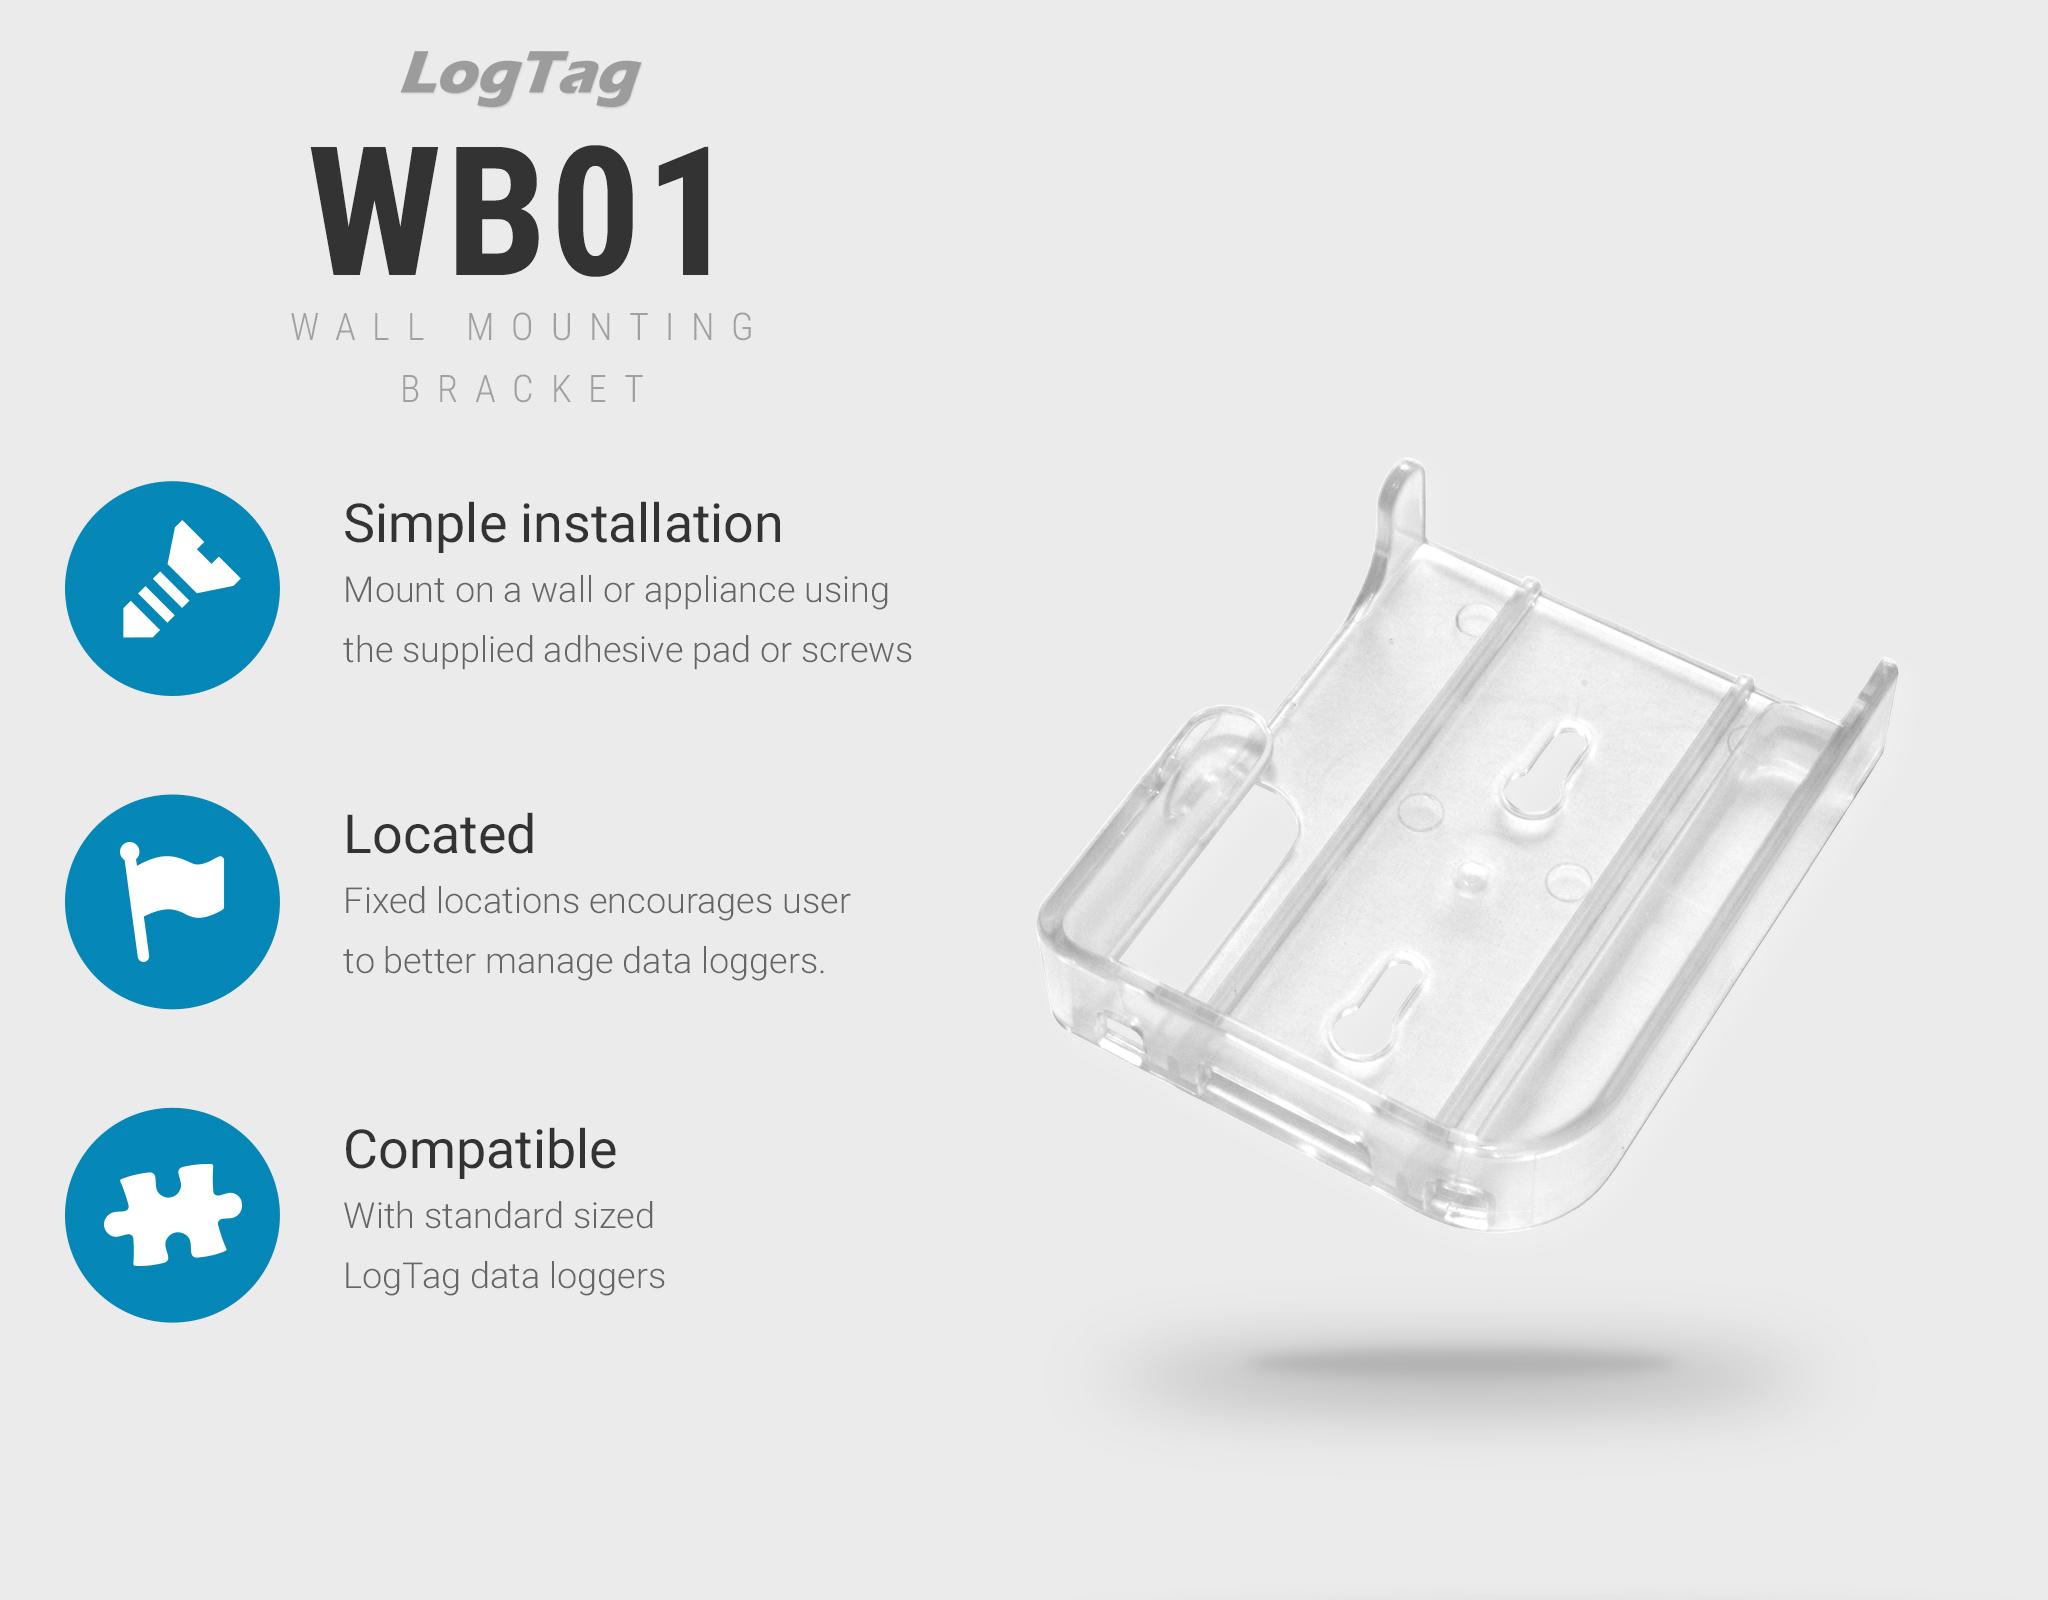 wb01-wall-mounting-bracket